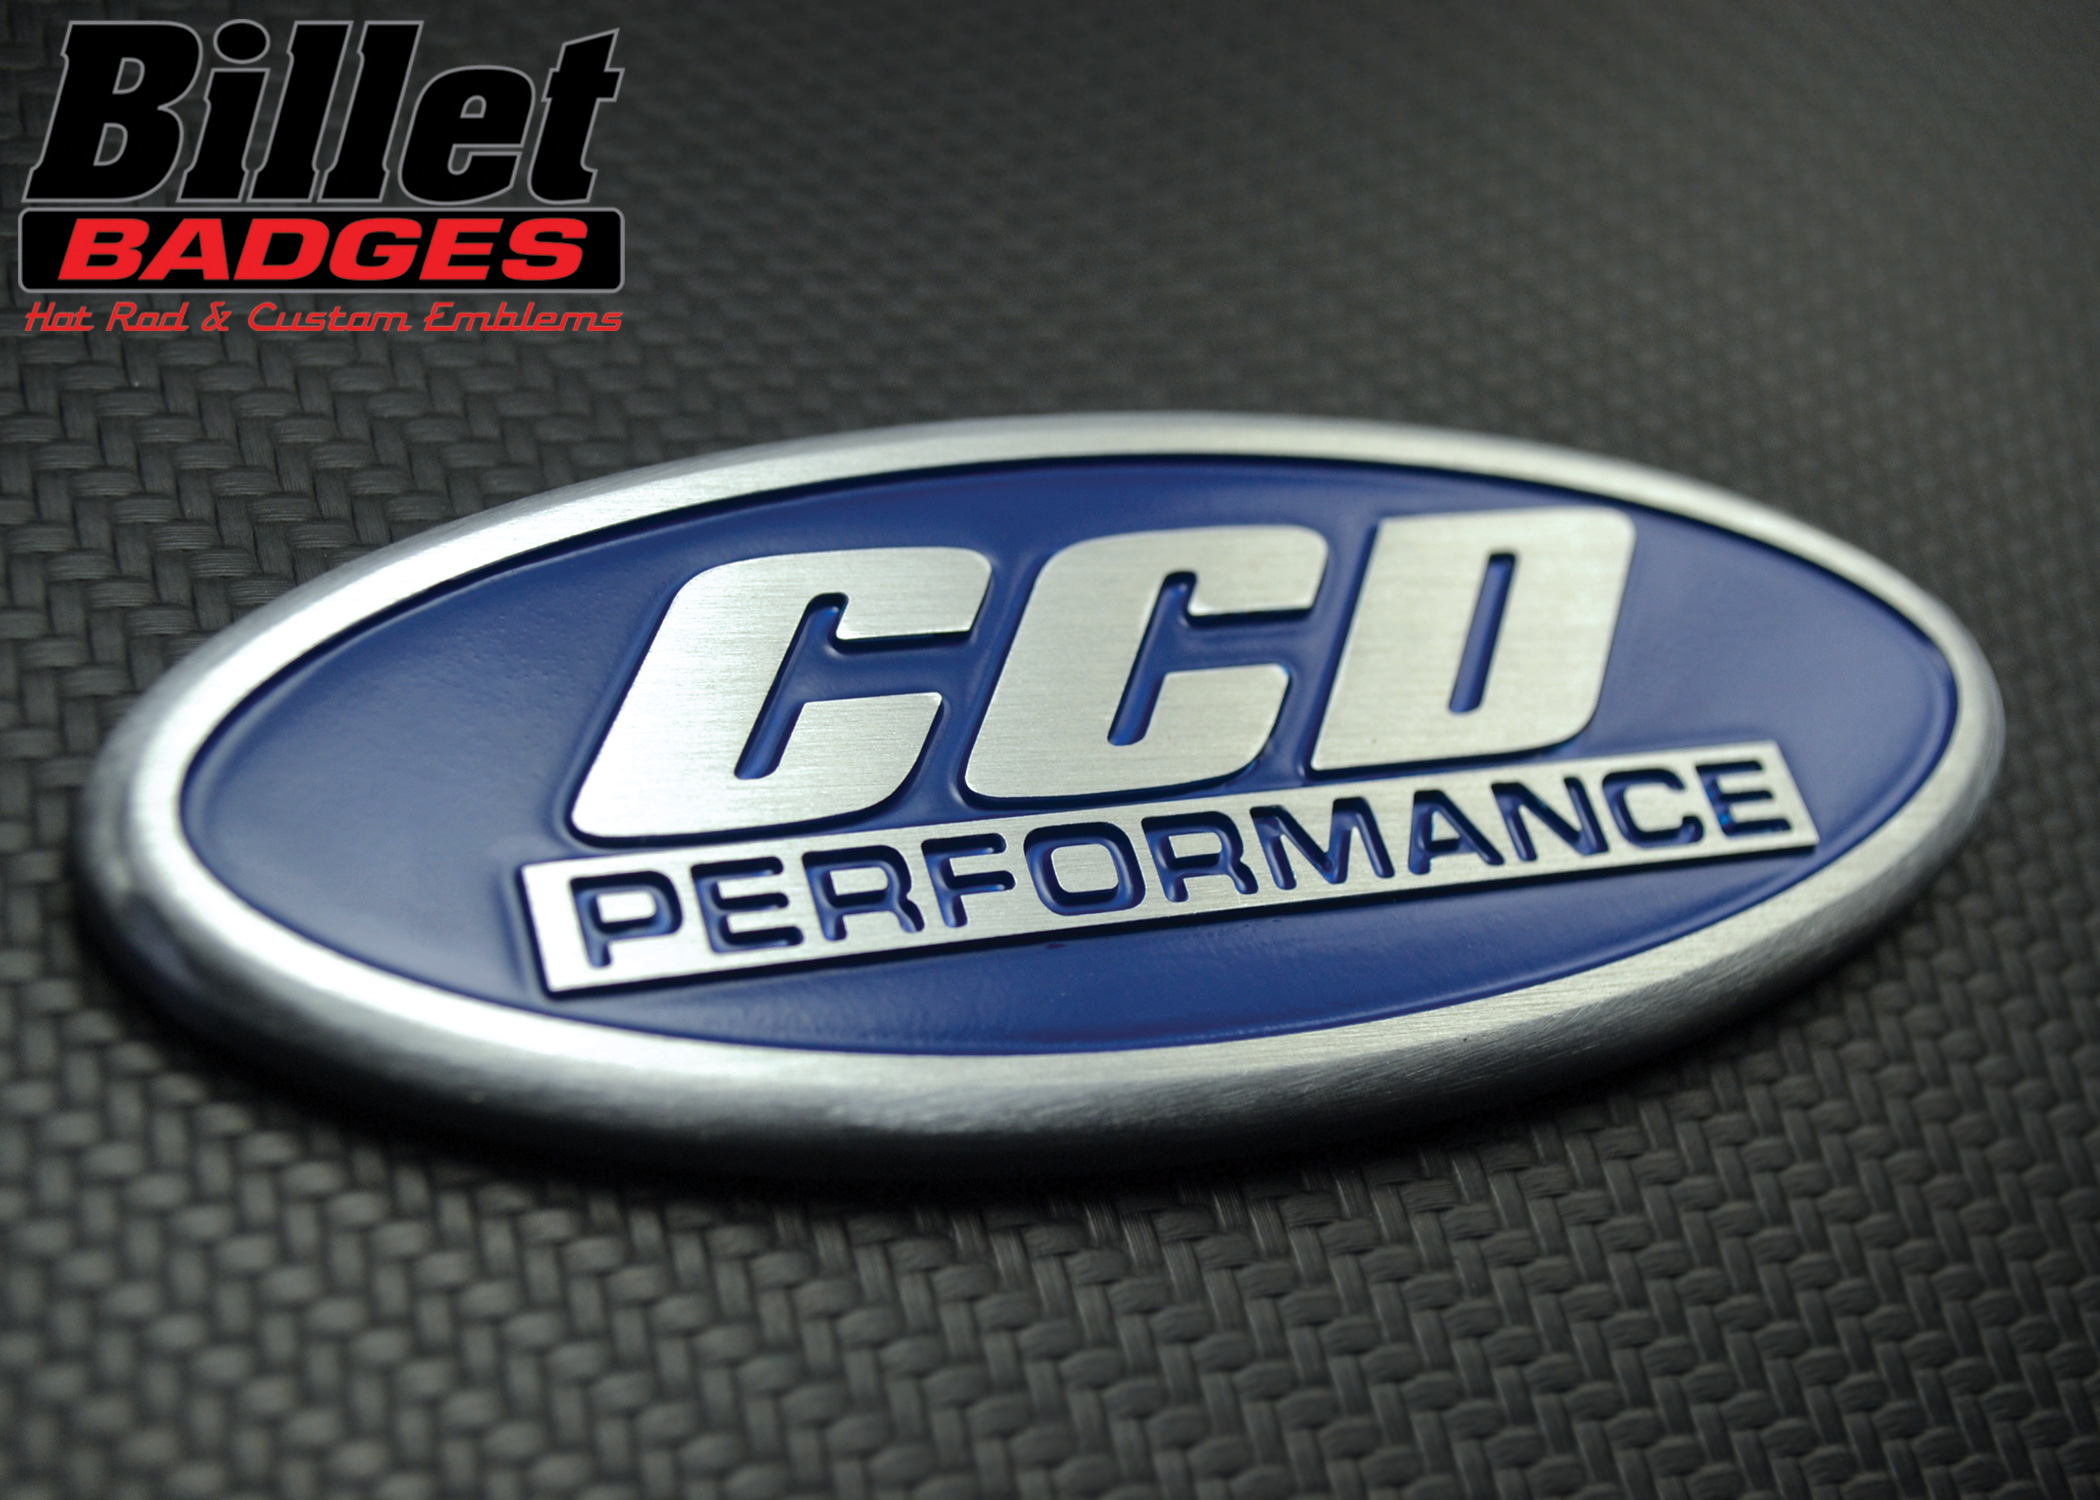 ccd_performance_45_oval.jpg